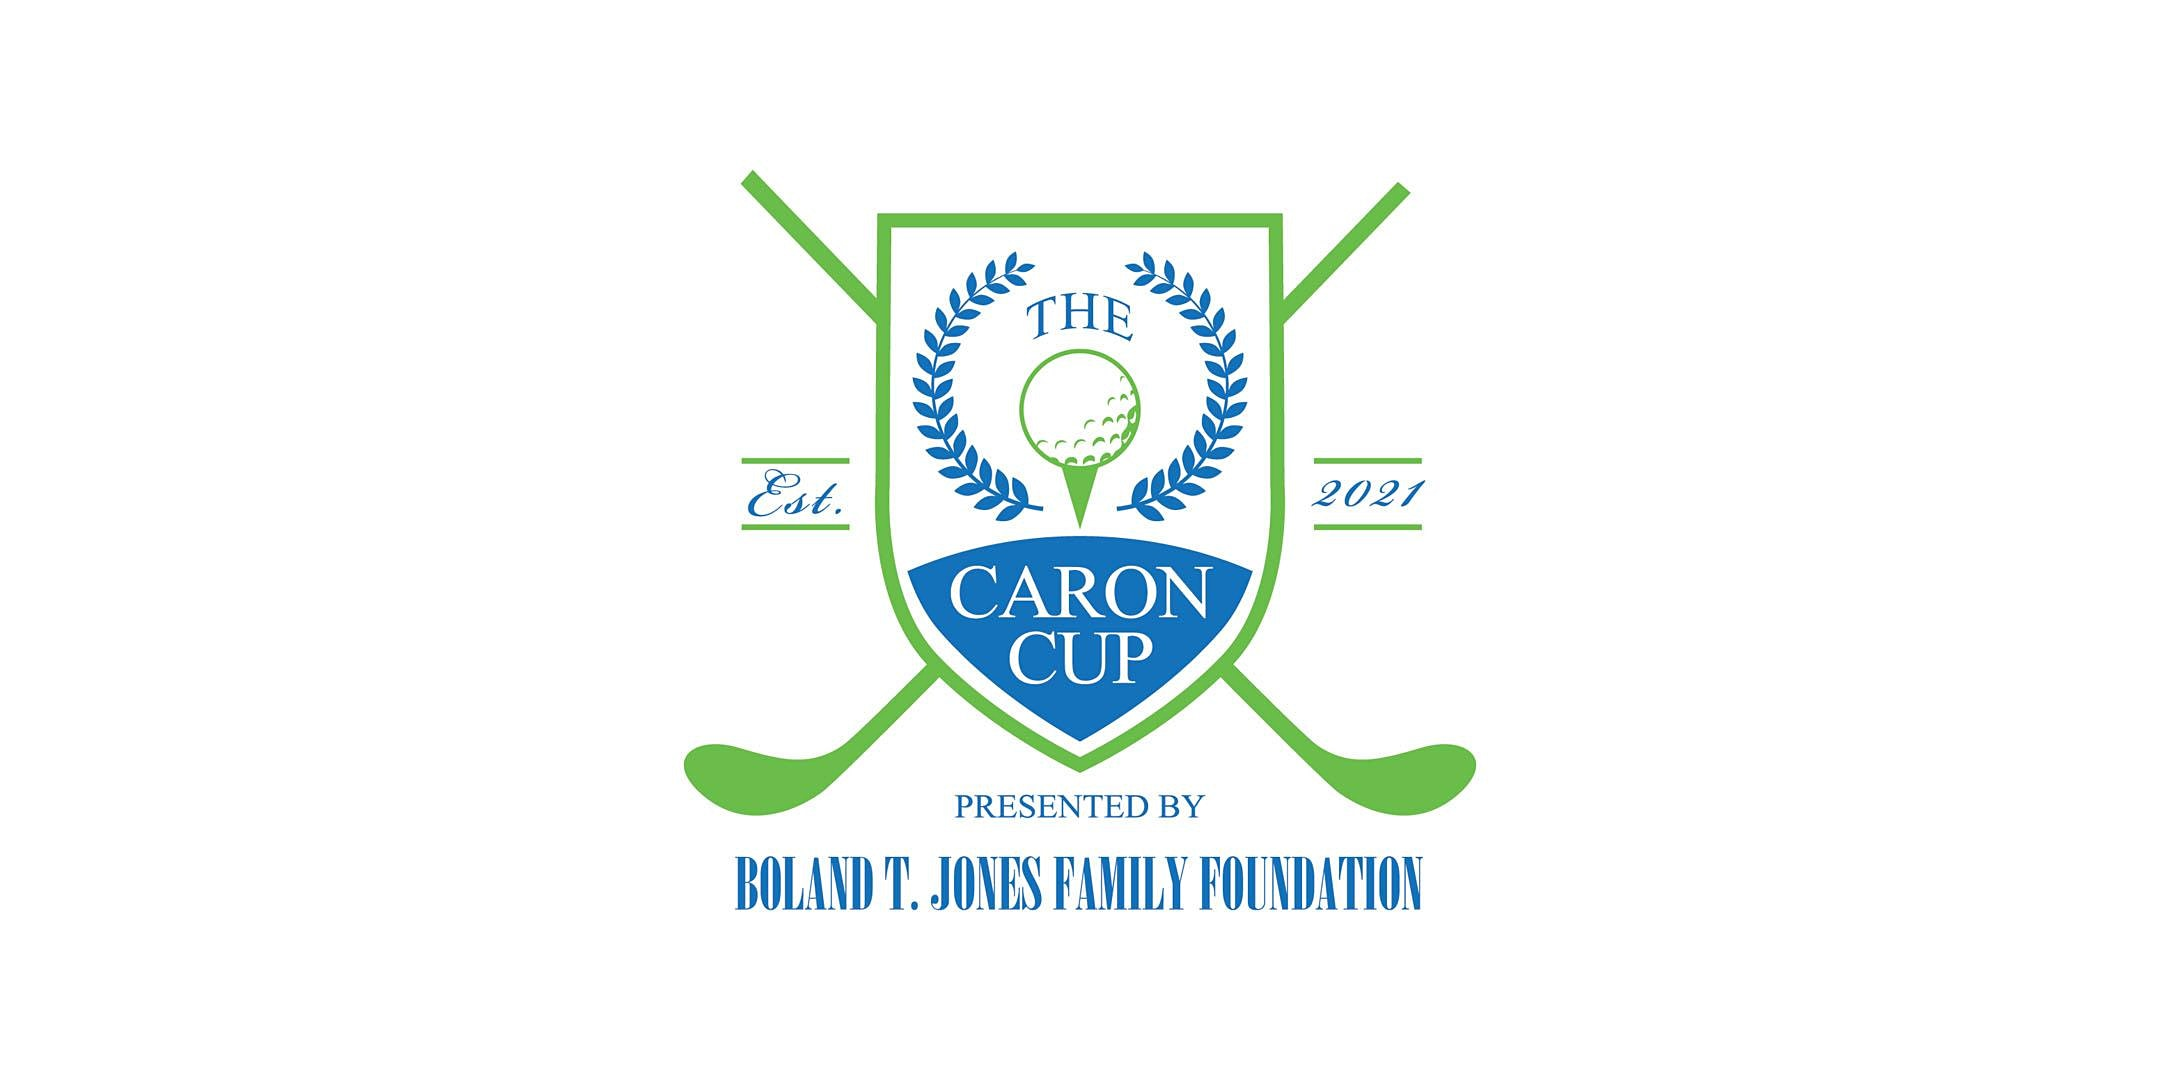 The Caron Cup